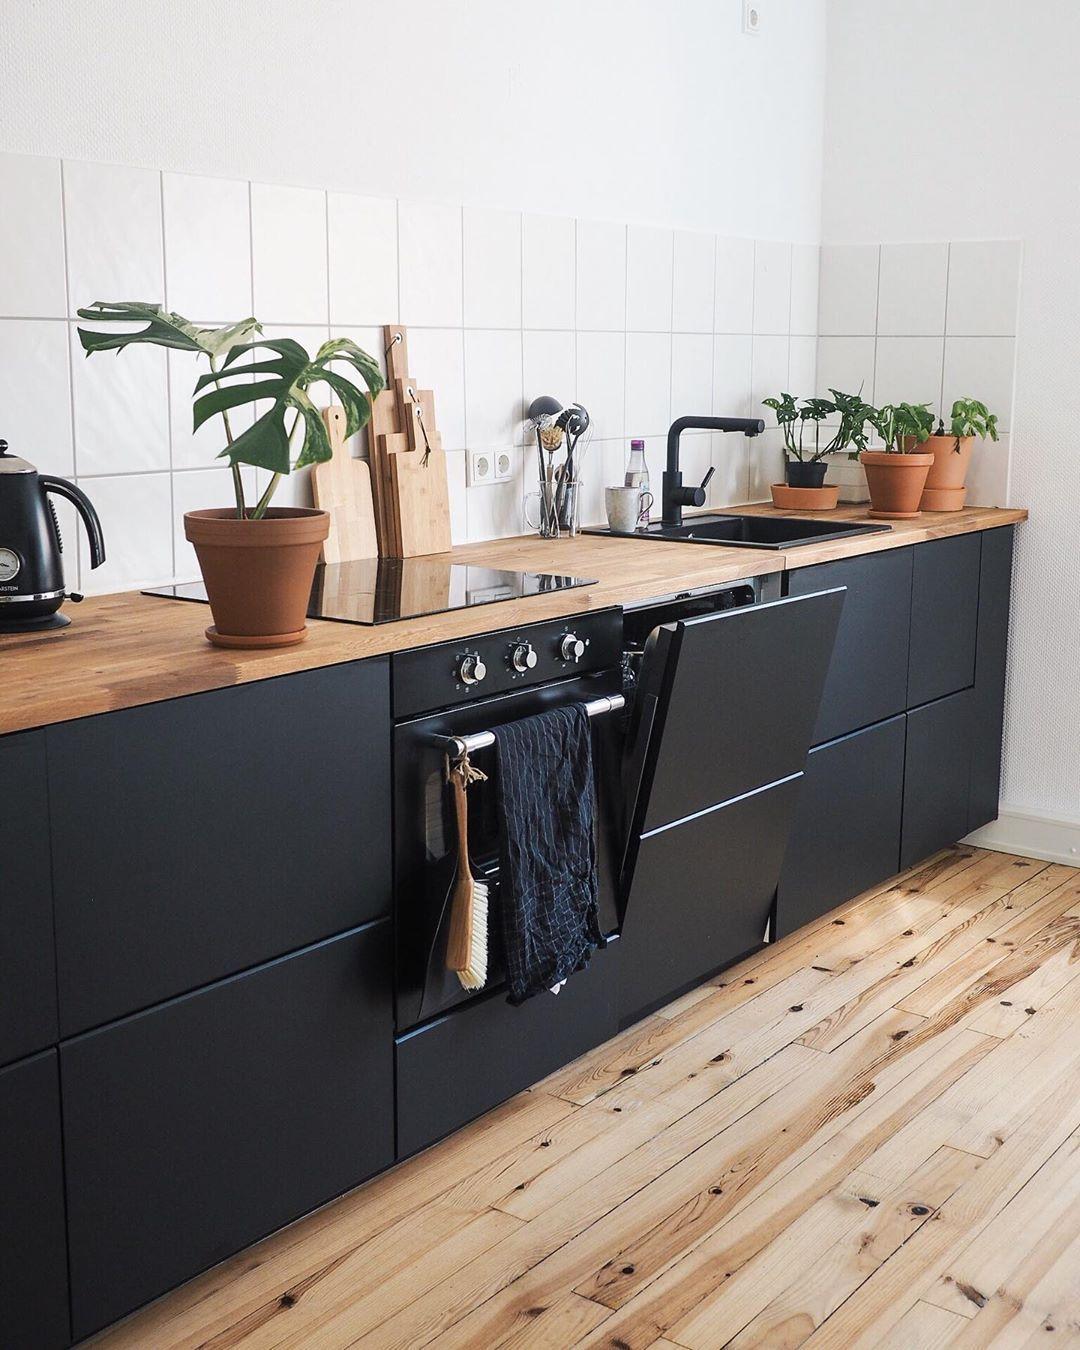 Ikea Metod Küche Front Kungsbacka #ikeakeuken #kitchen